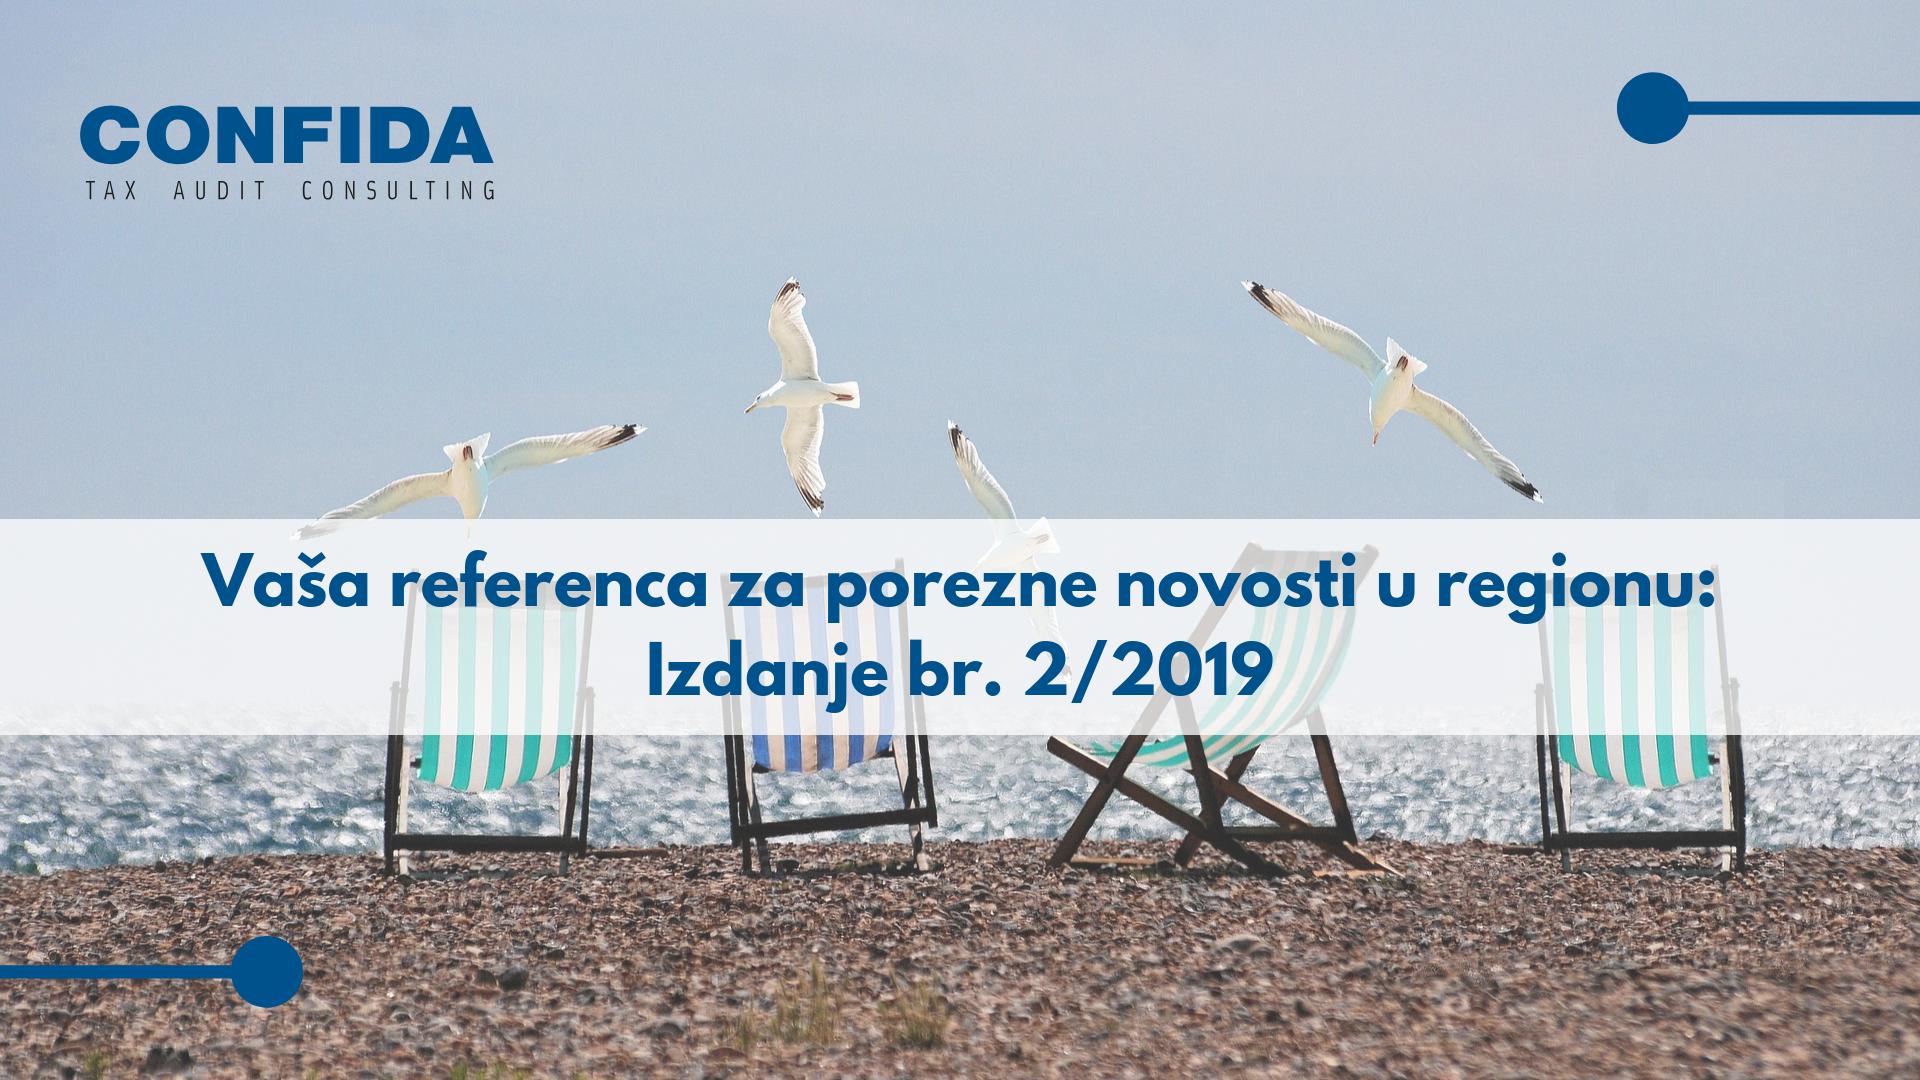 Vaša referenca za porezne novosti u SEE: Izdanje br. 2/2019